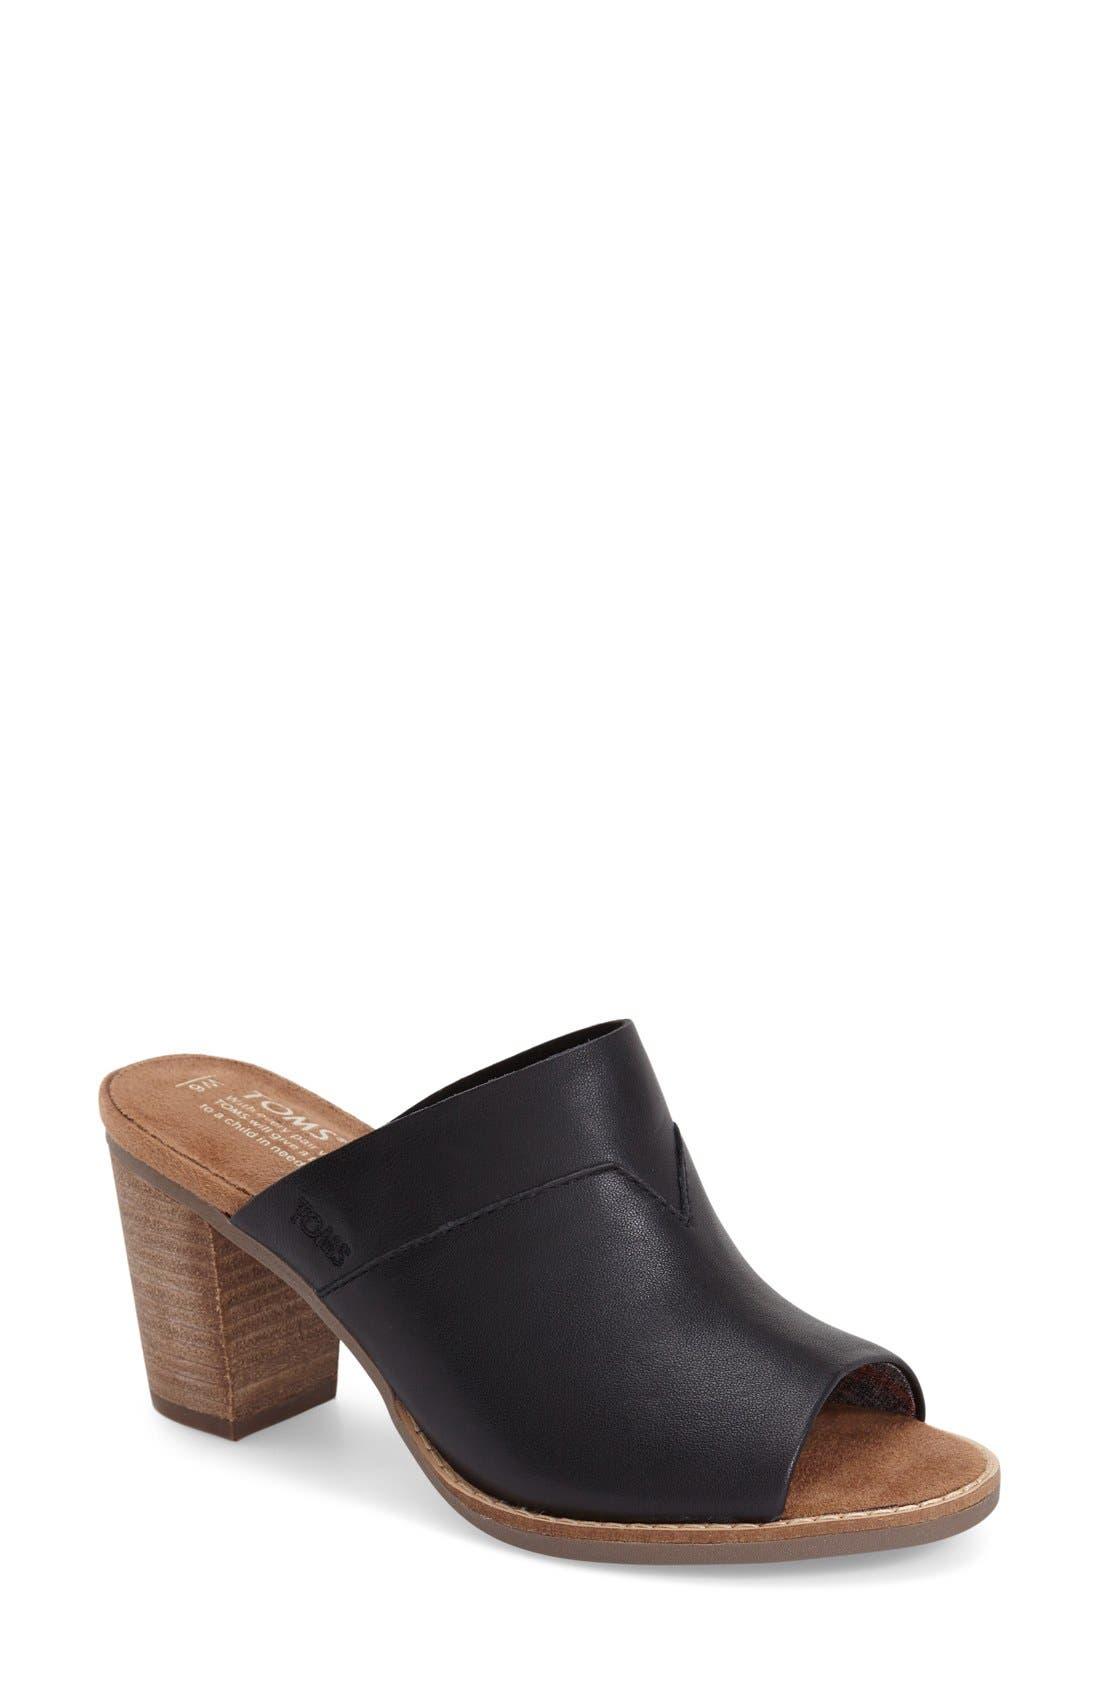 'Majorca' Mule Sandal, Main, color, 001